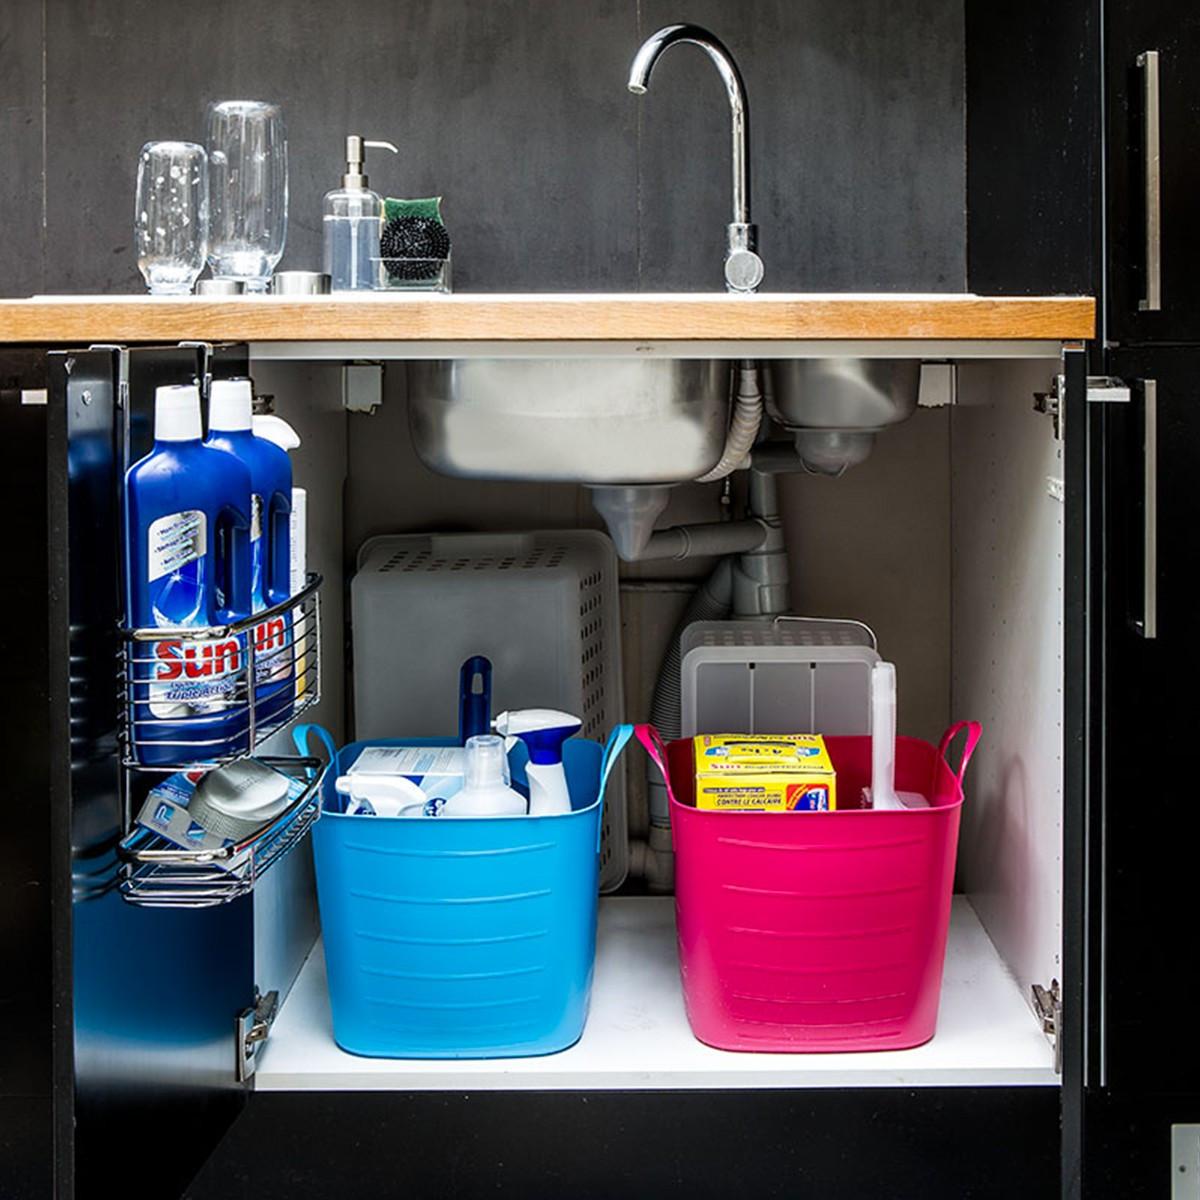 bac rangement plastique souple taupe 15 litres. Black Bedroom Furniture Sets. Home Design Ideas